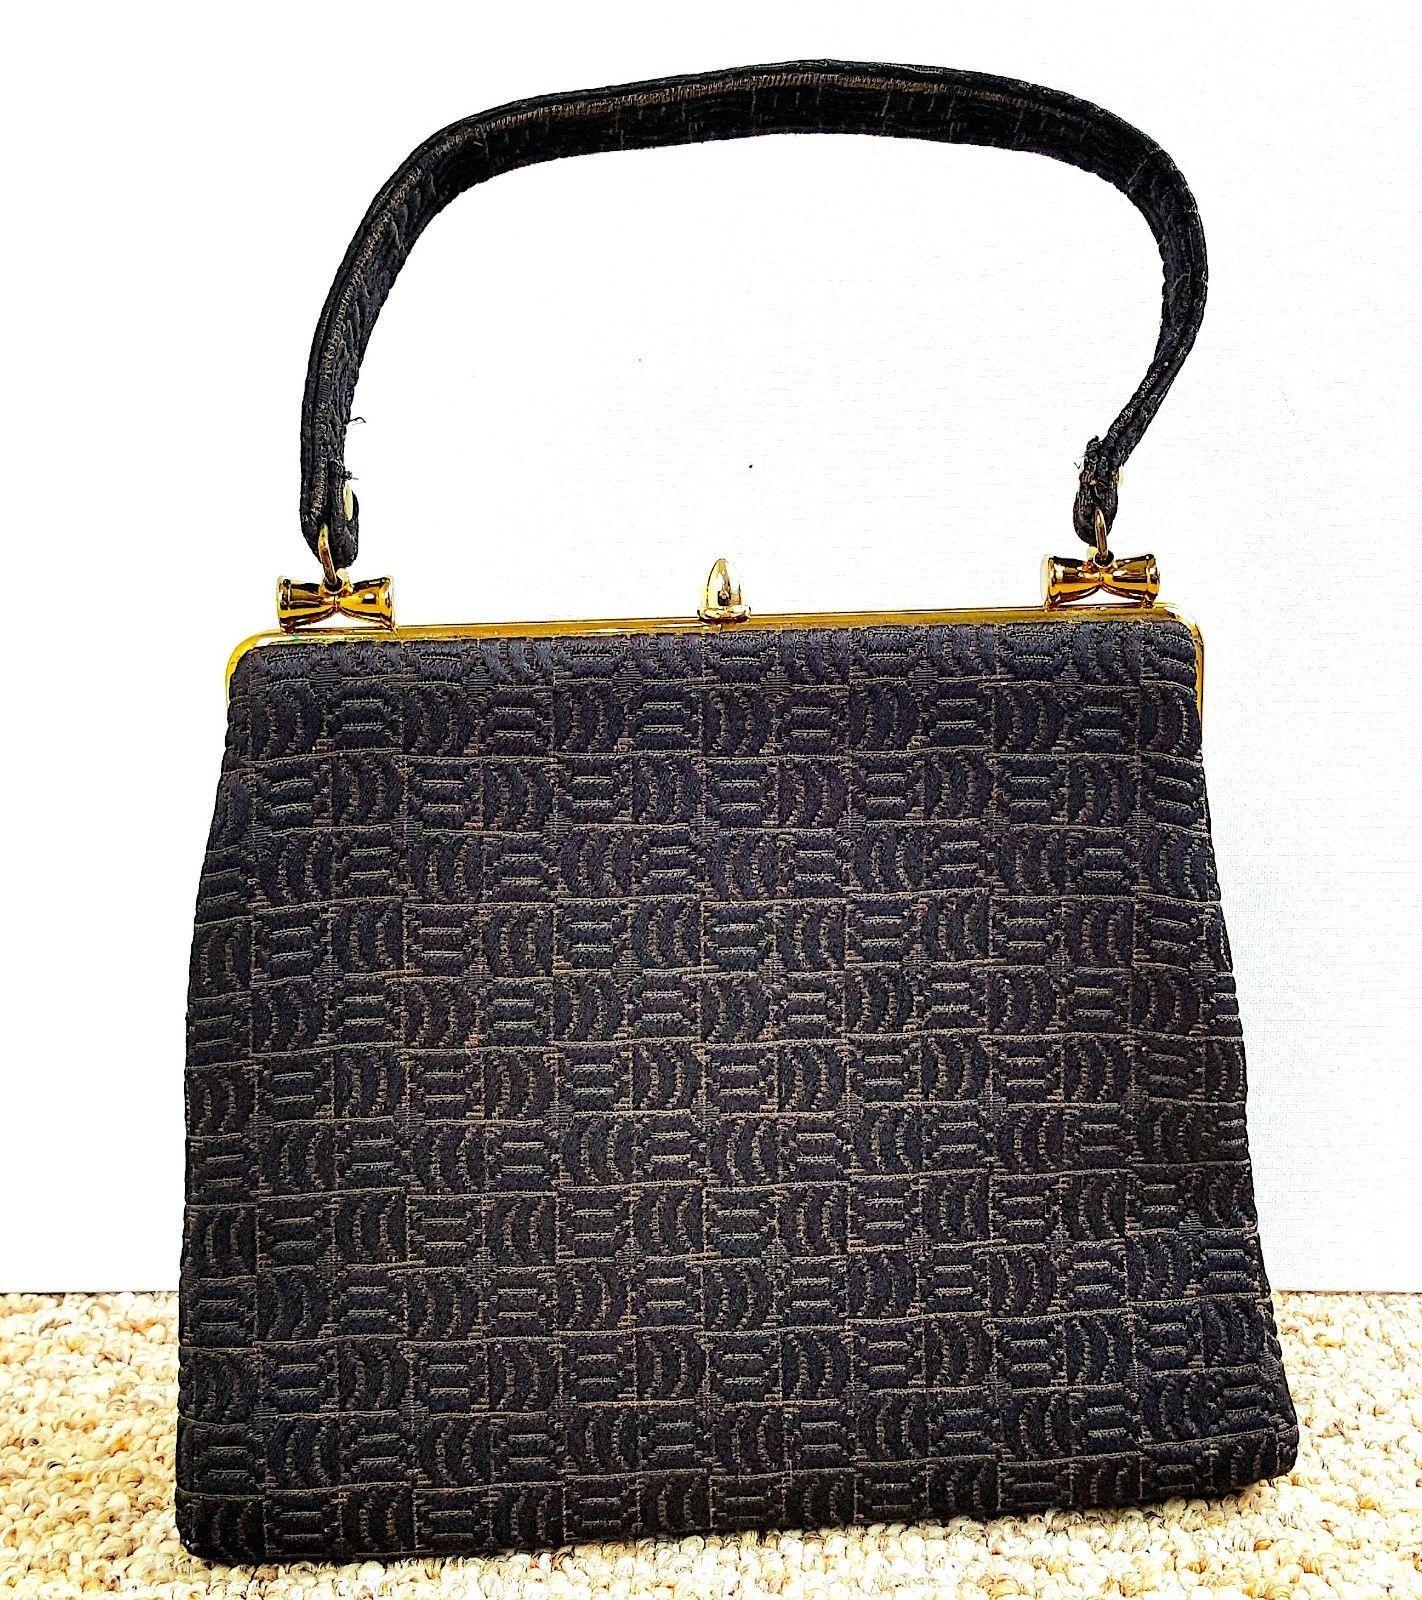 37.63$  Buy now - http://viism.justgood.pw/vig/item.php?t=5xsogjc14351 - VTG 50's 60's Bobbie Jerome Brown Fabric Stitched Design Handbag Satchel Purse 37.63$